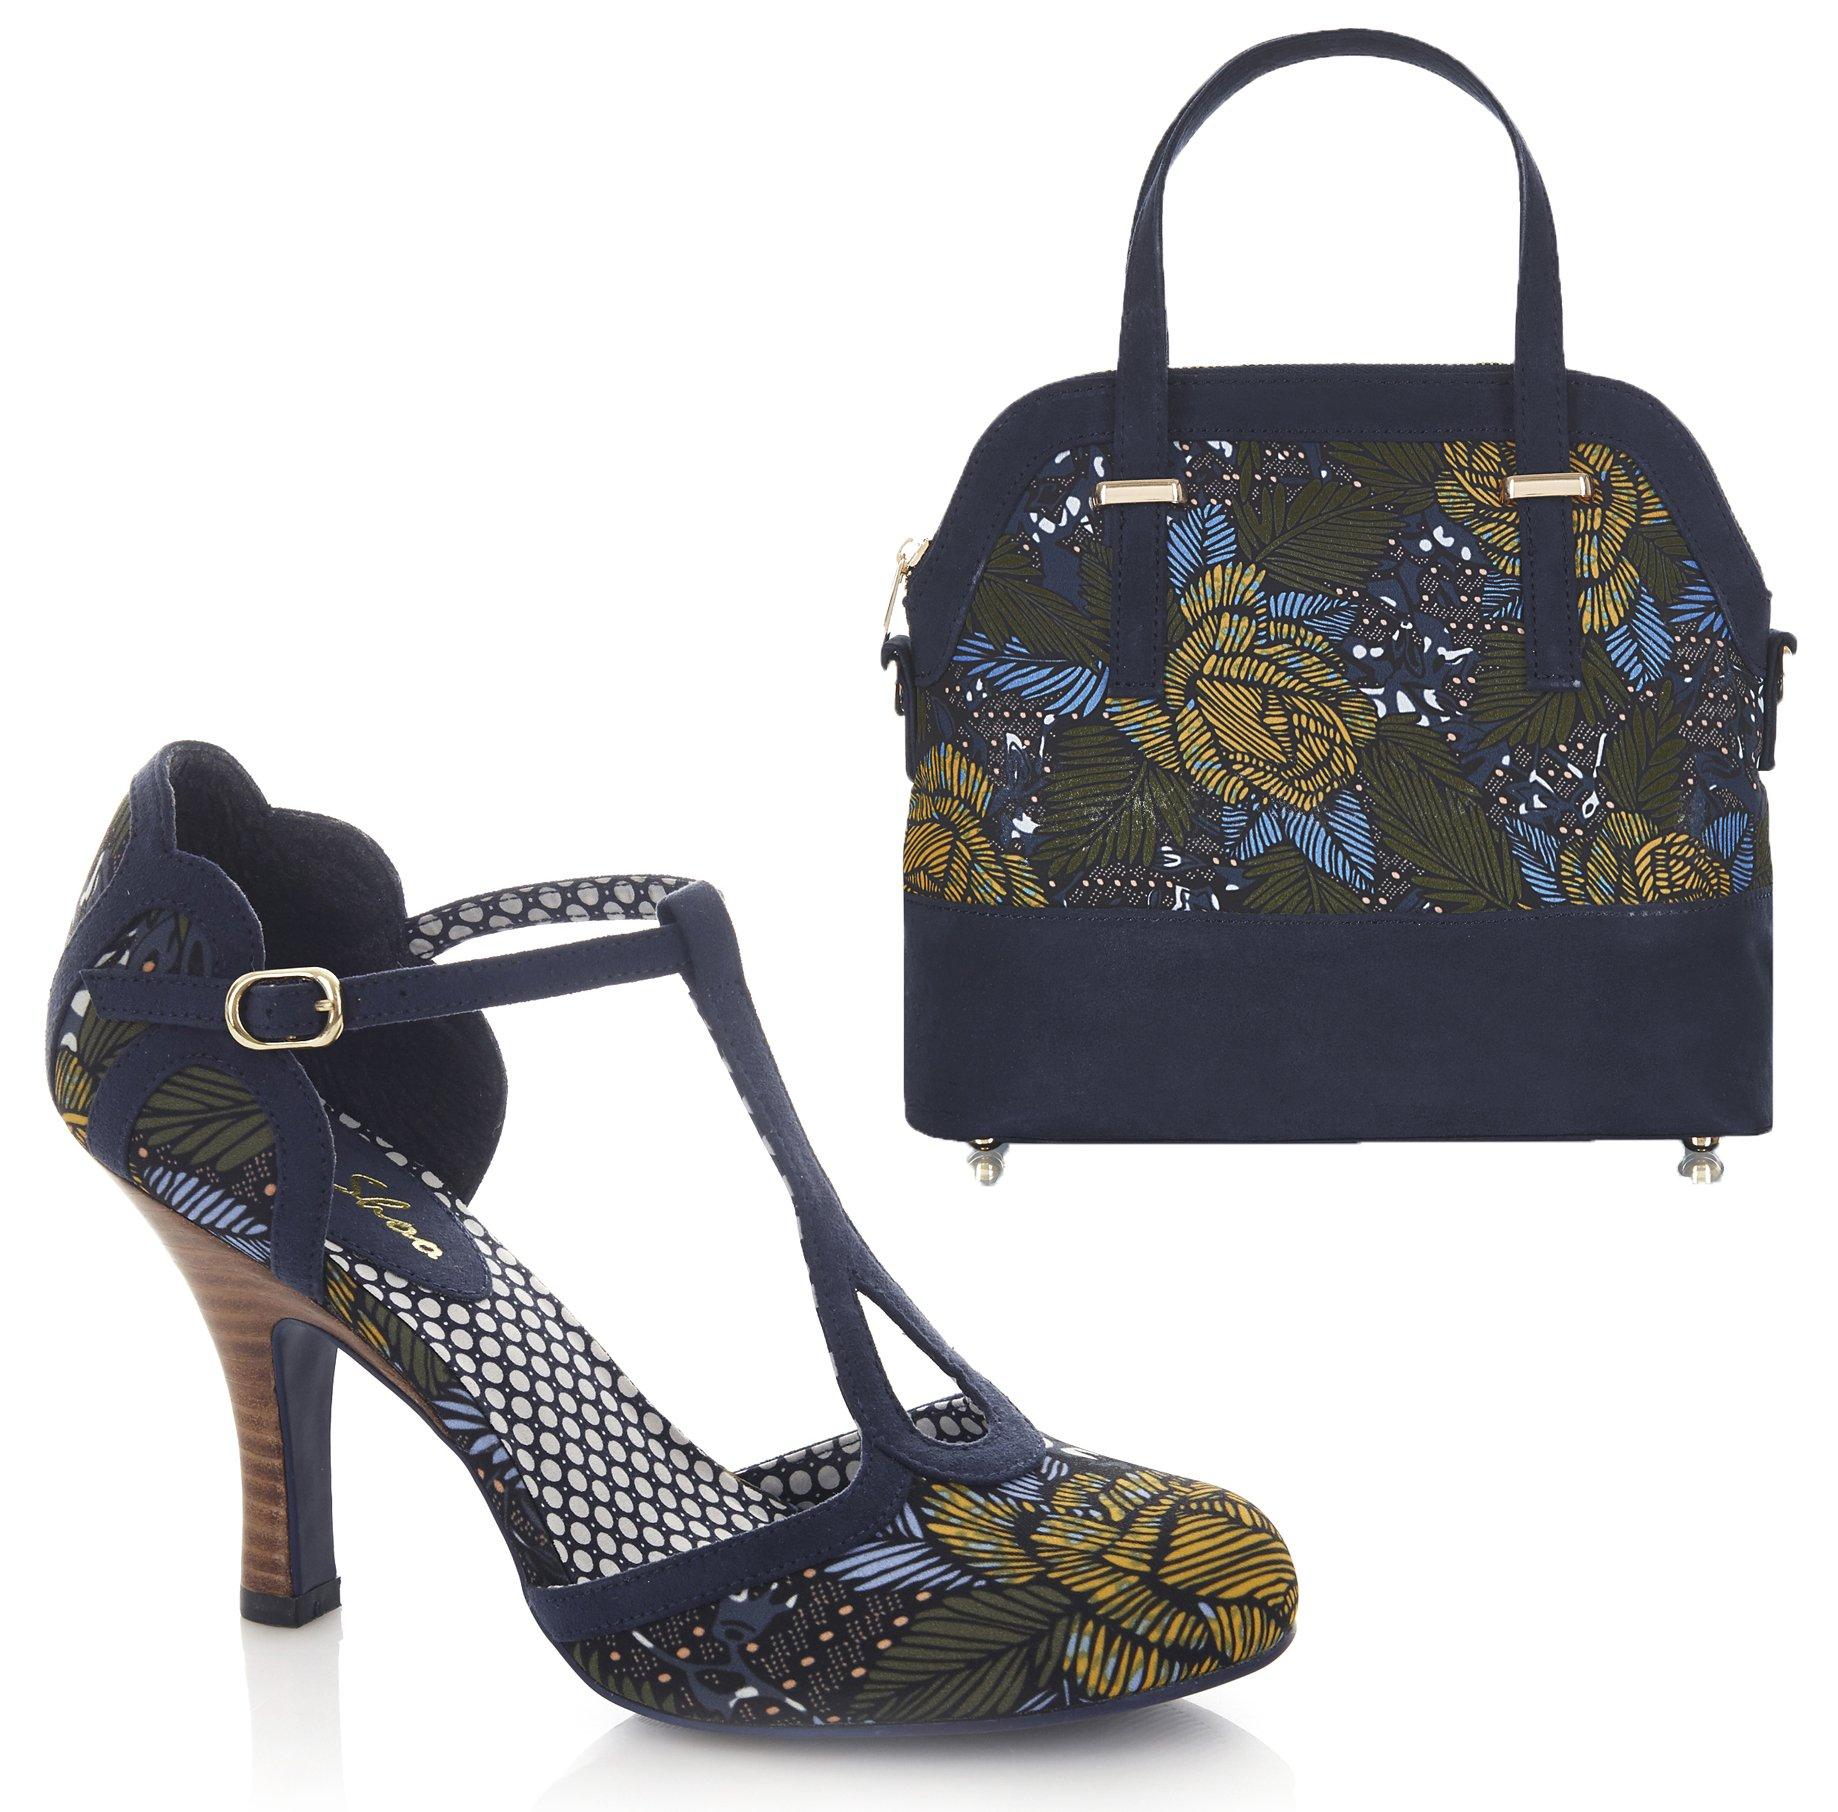 Ruby Shoo Women's Jungle Print Polly Mary Jane Pumps & Matching Lima Bag UK 6 EU 39